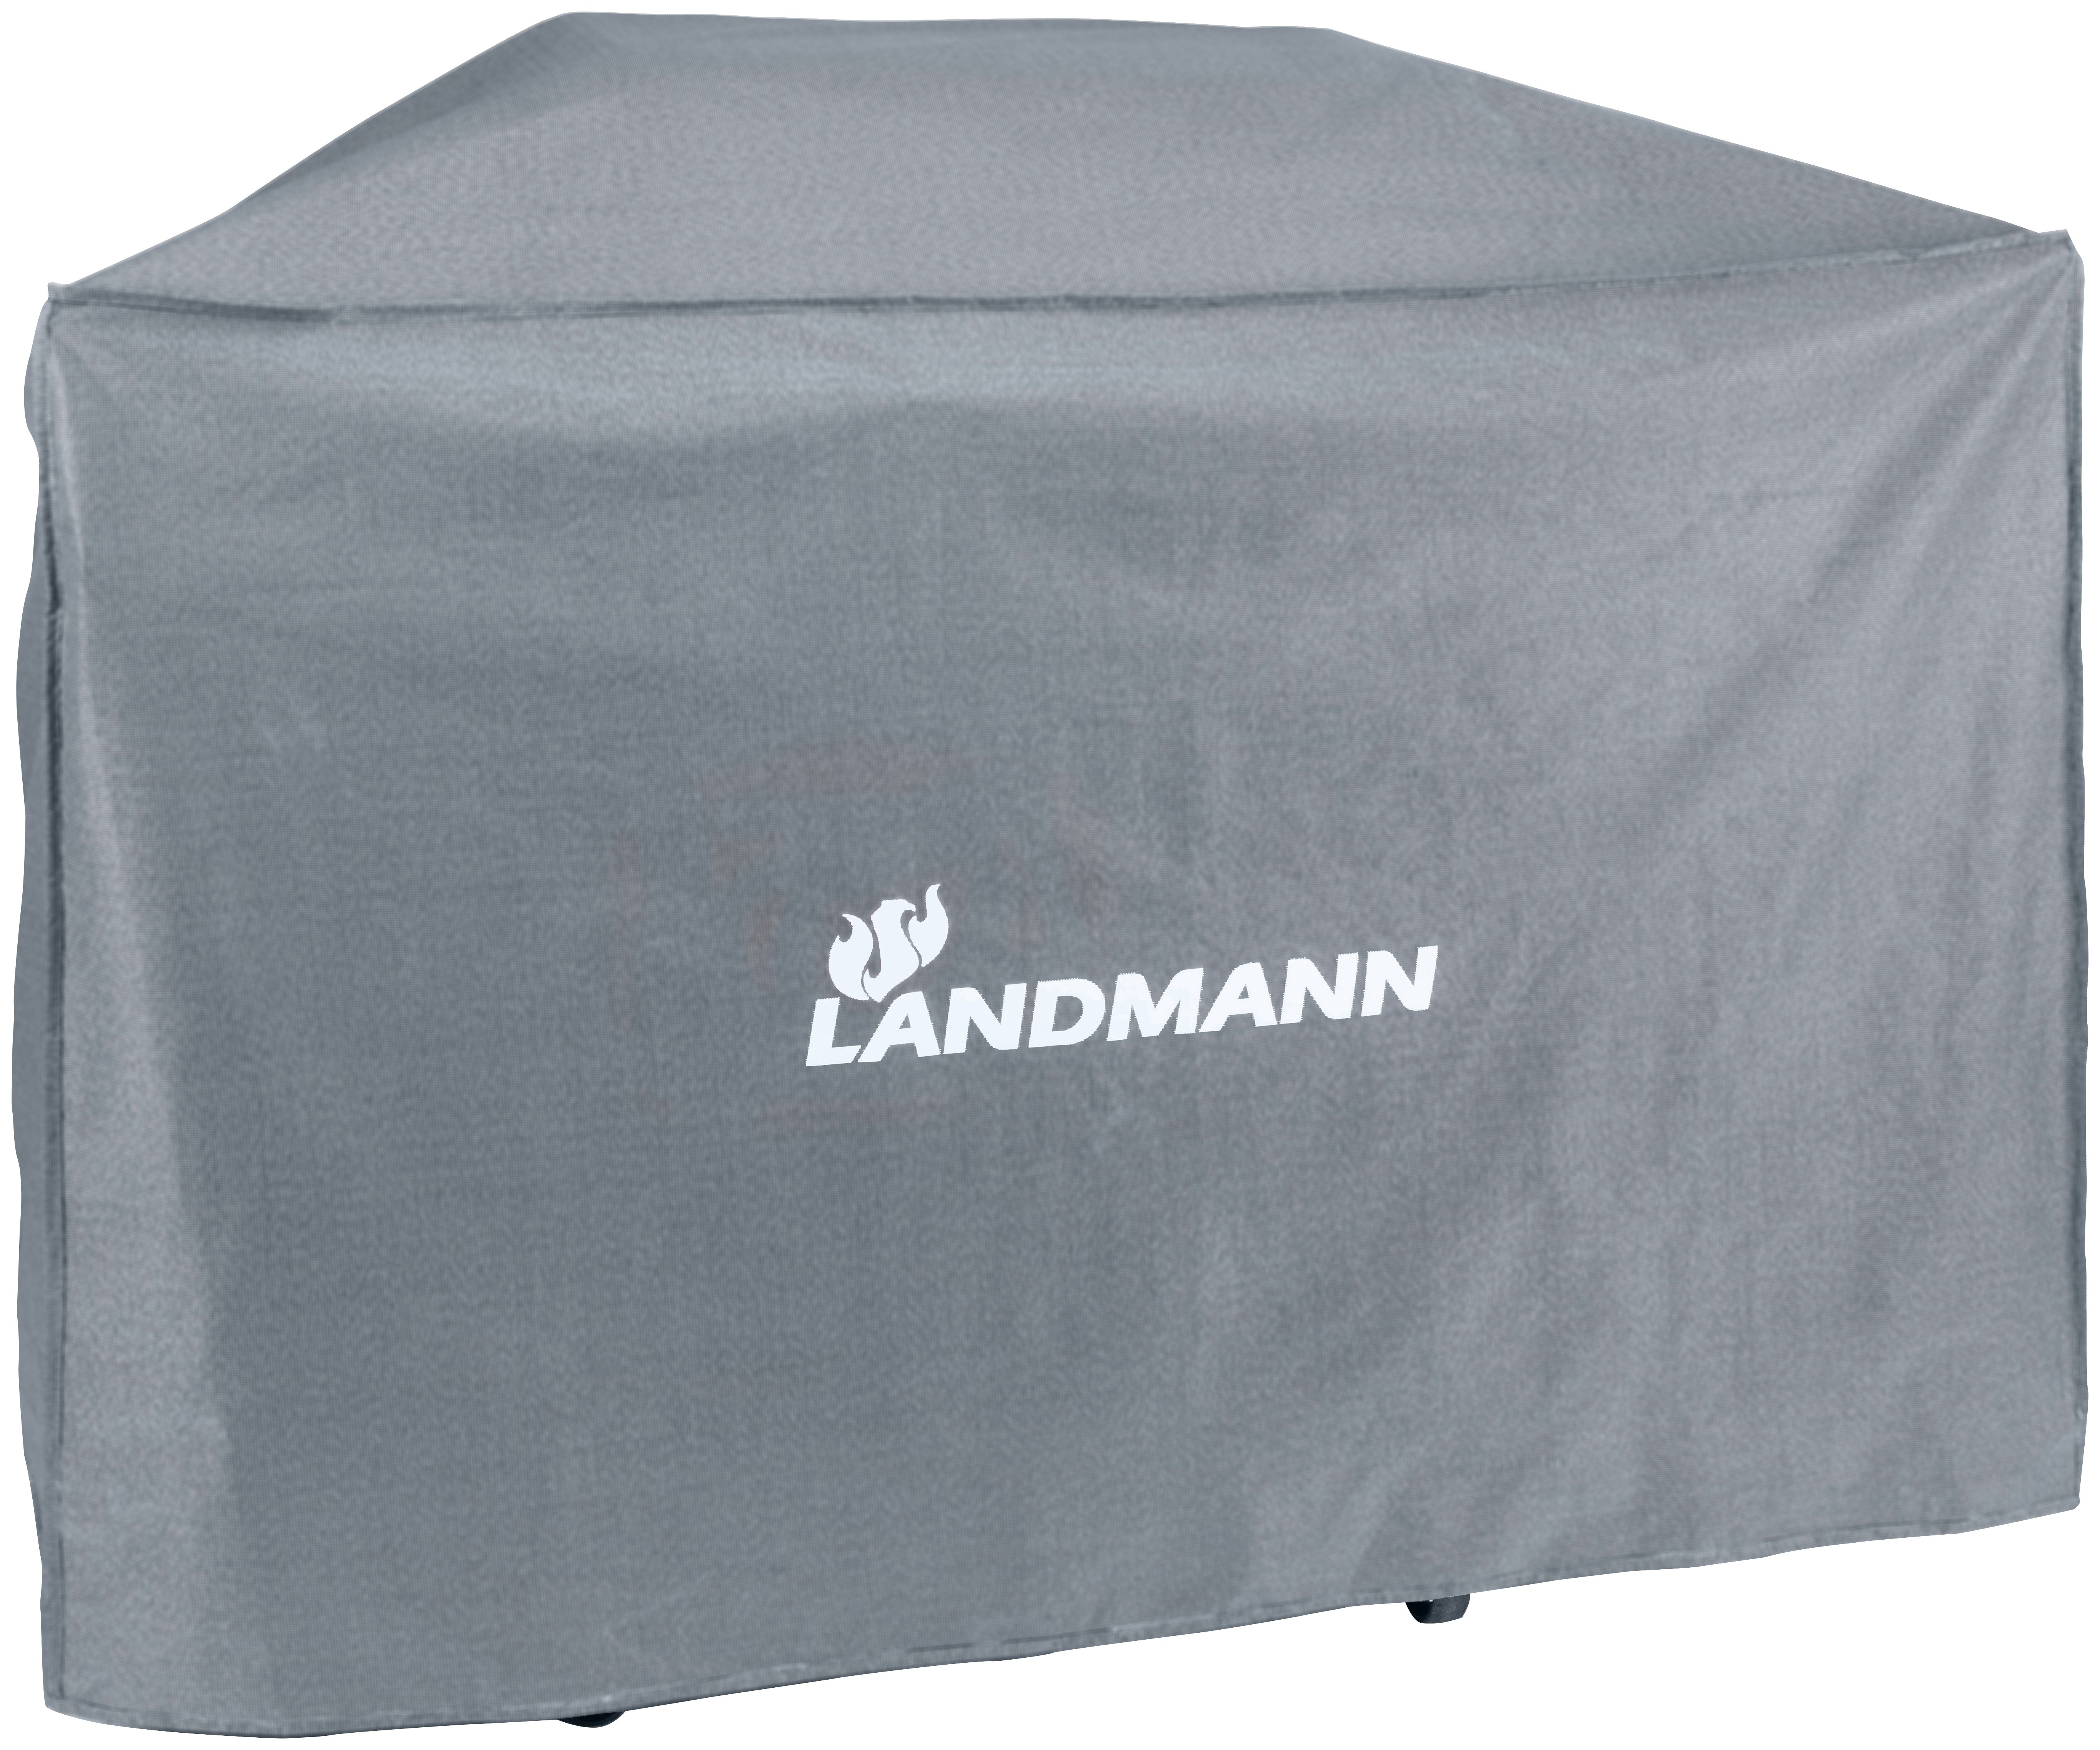 Landmann Premium Extra Large Cover